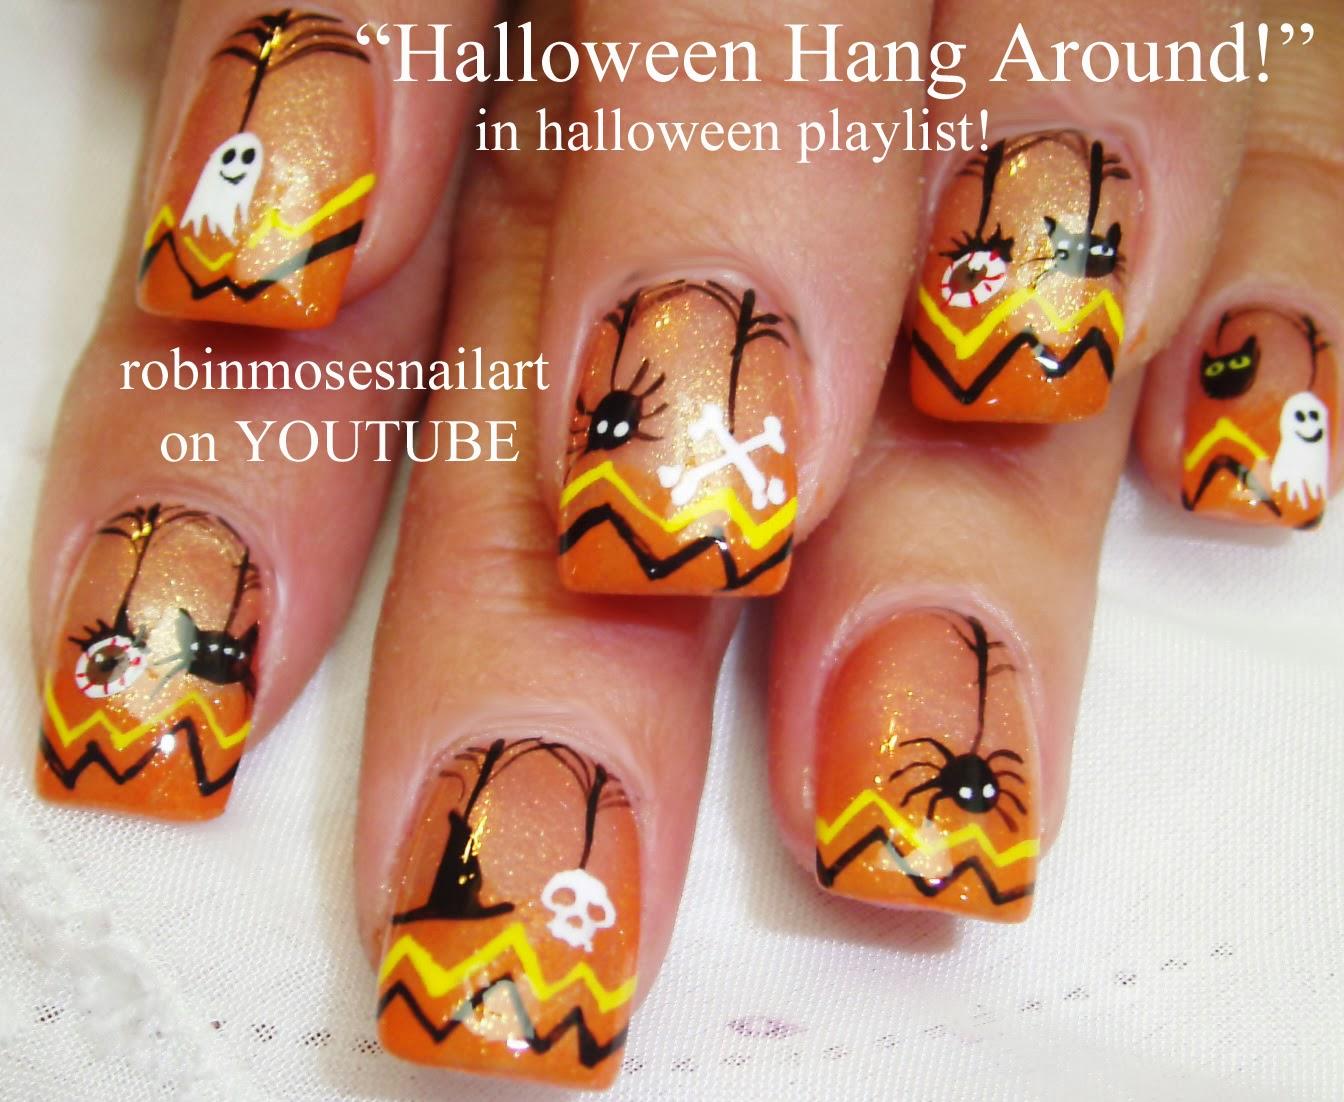 Robin moses nail art halloween ideas halloween designs nail halloween ideas halloween designs nail art halloween nails cute halloween designs halloween tutorials halloween ideas halloween costumes prinsesfo Choice Image